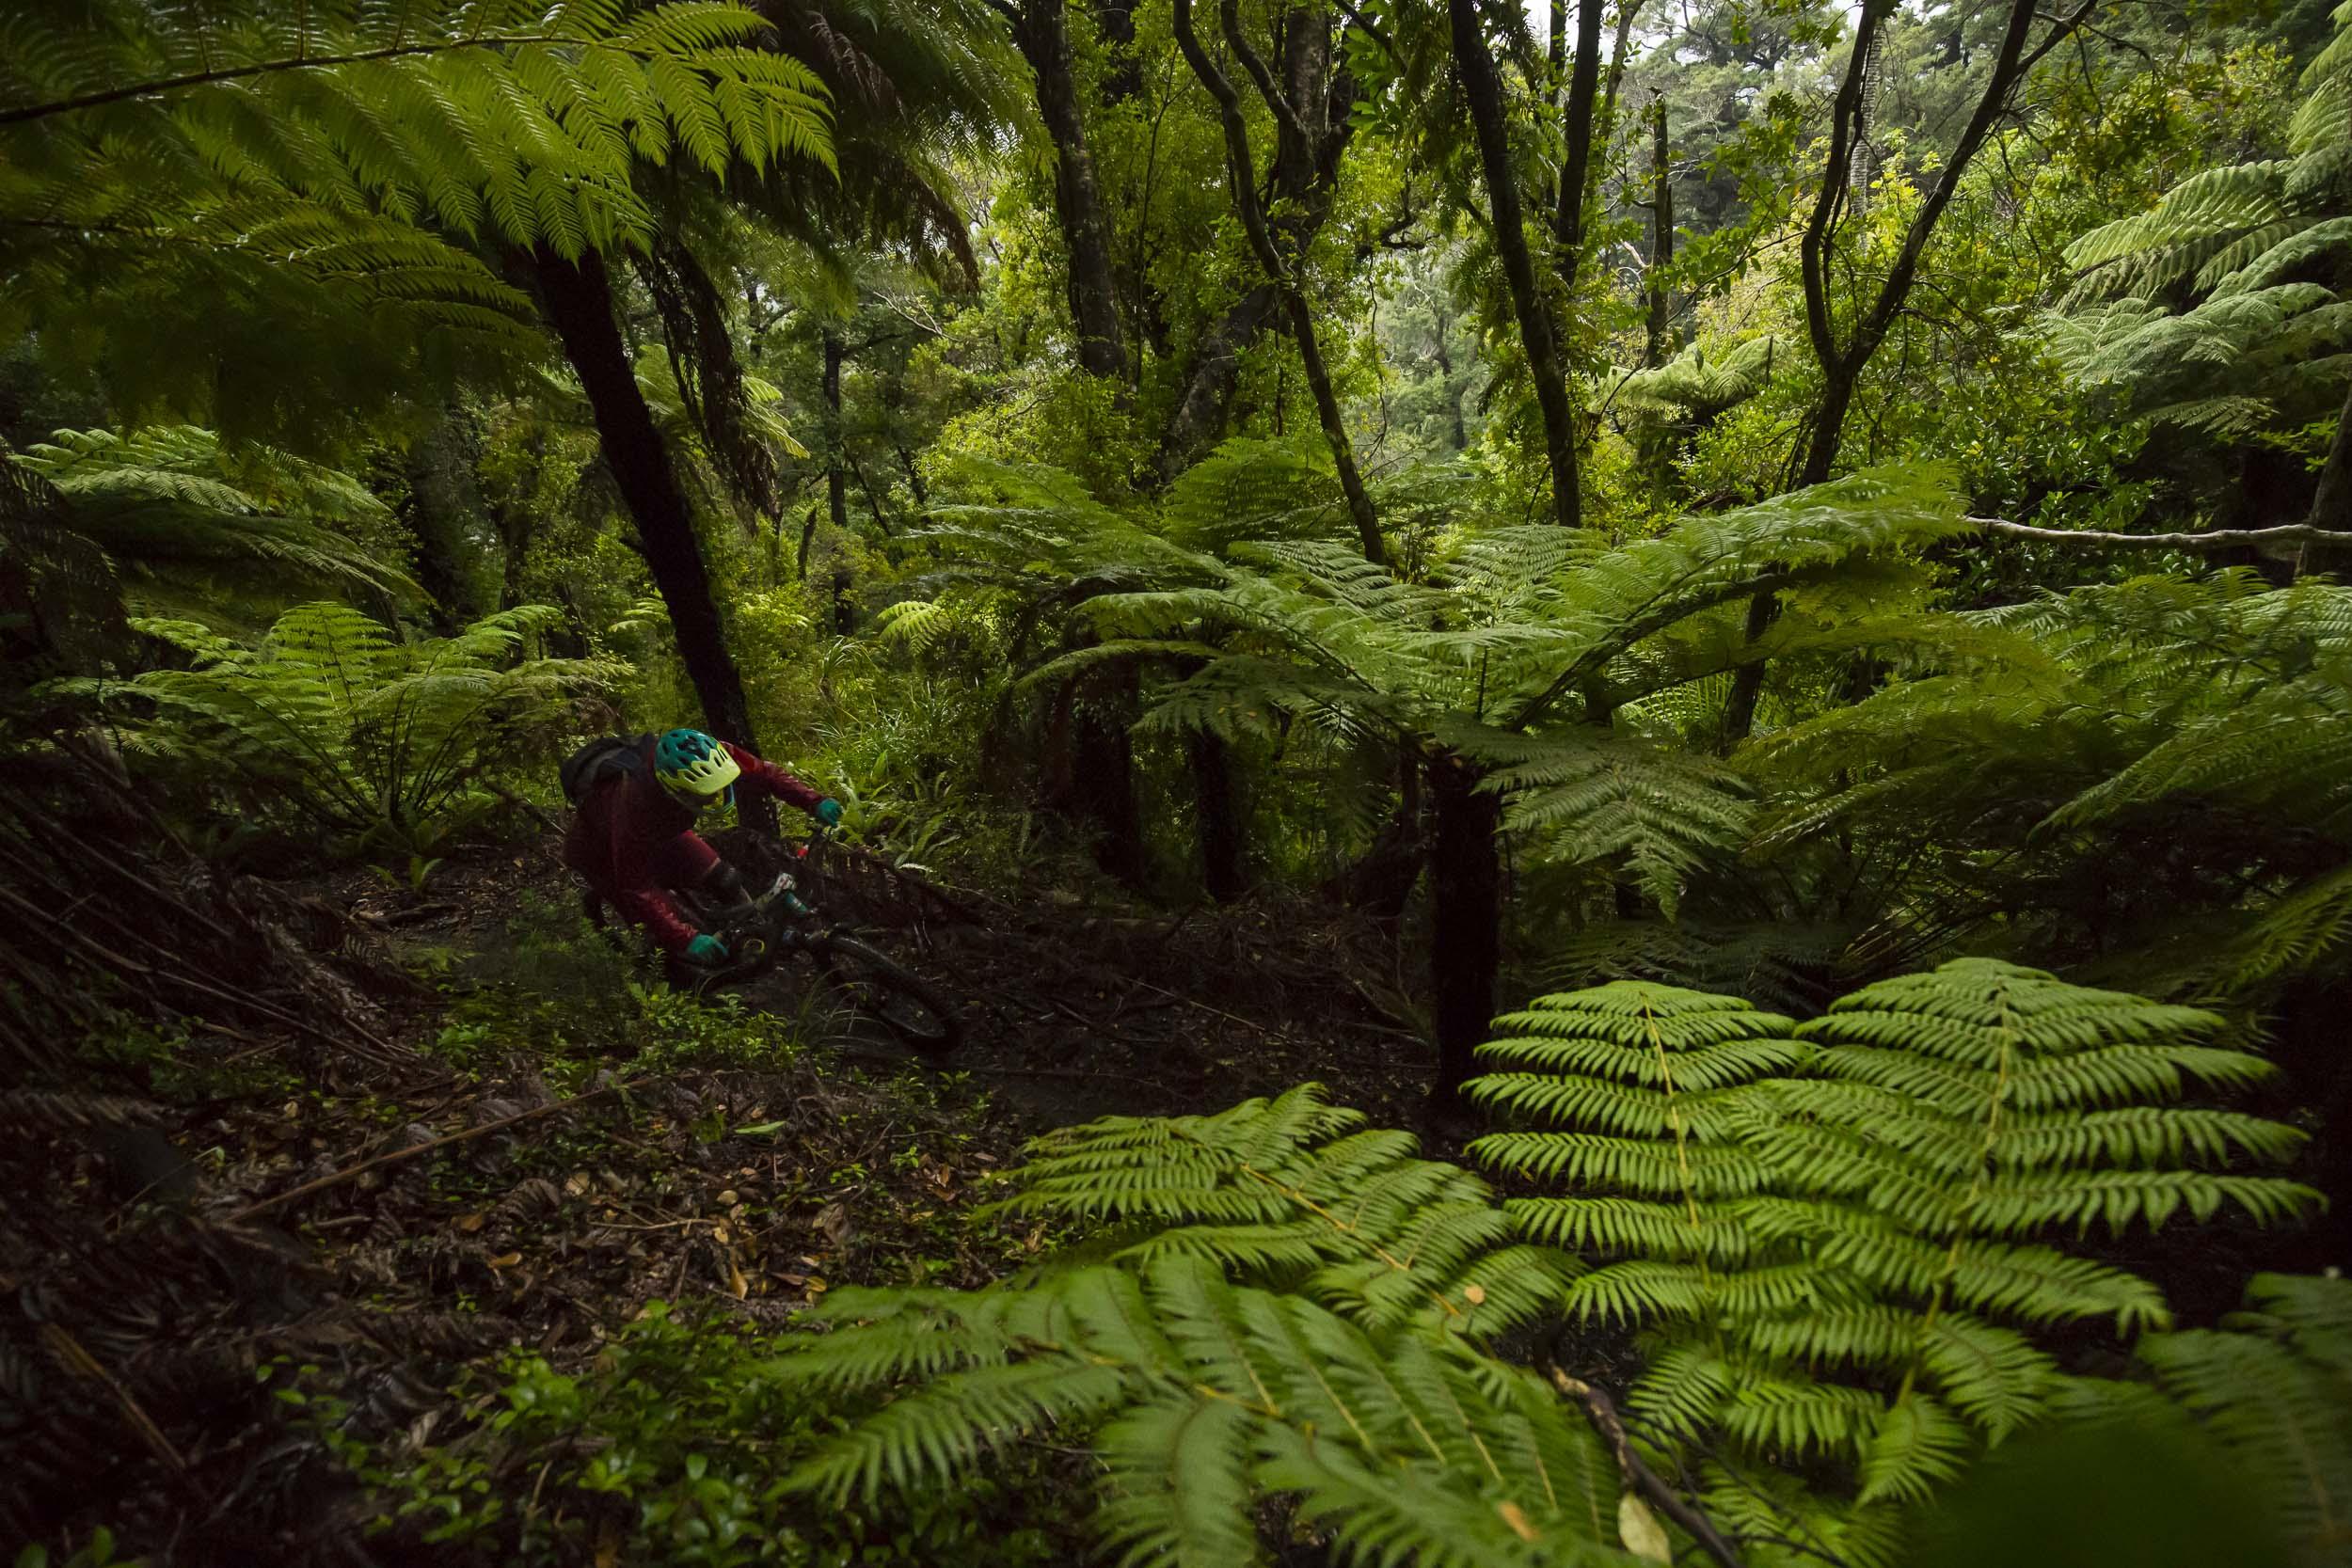 NK_NZ_Enduro_Day2-9.jpg